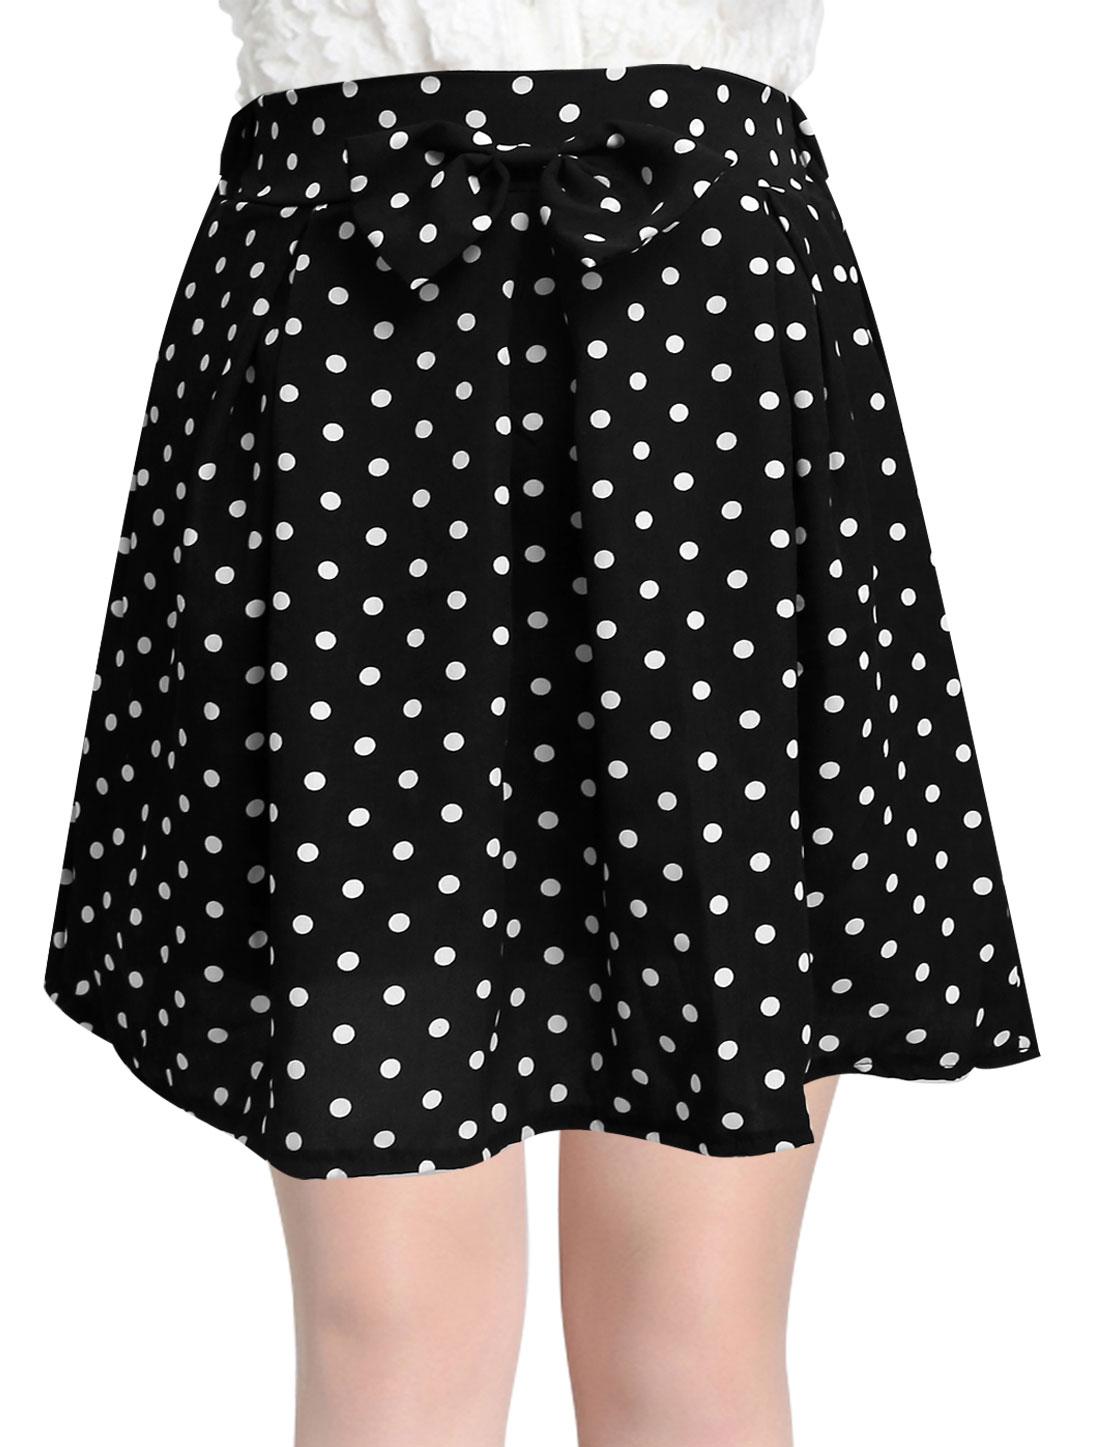 Lady Elastic Waist Bowknot Decor Dots Prints Skirt Black S